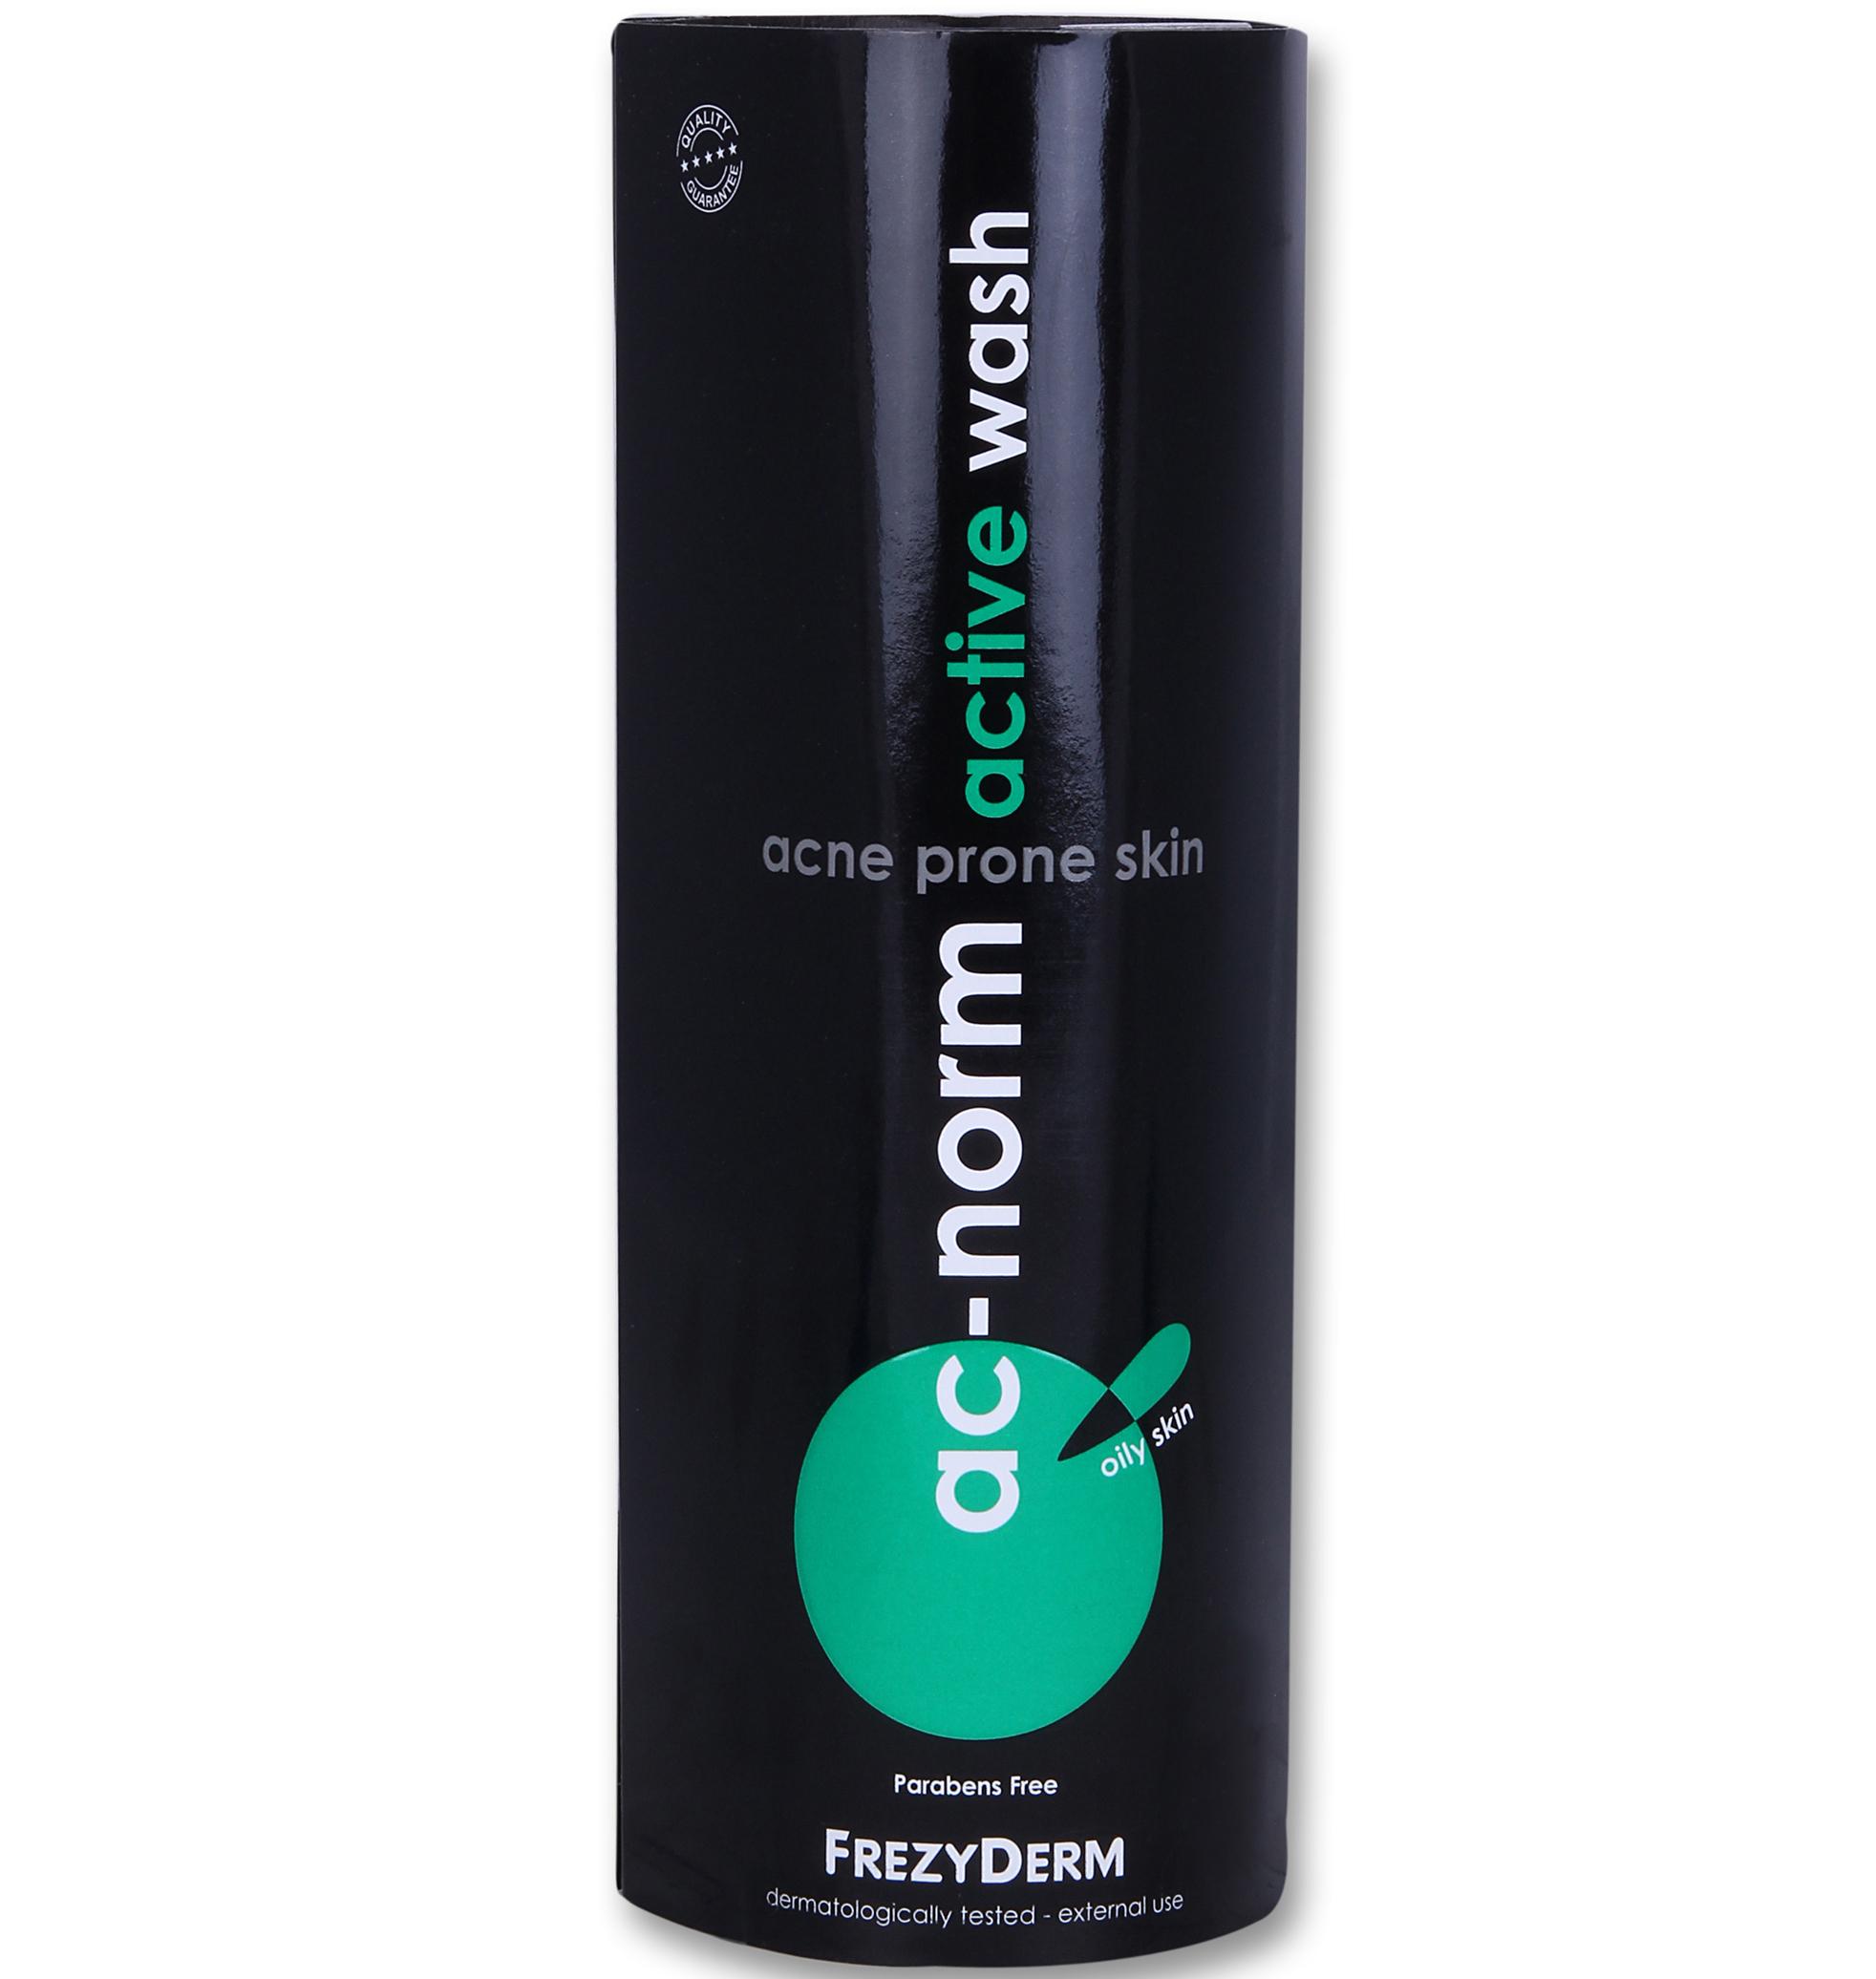 Frezyderm Ac-Norm Active Wash Καθαριστικό για Ακνεϊκές Επιδερμίδες 50ml ομορφιά   δέρματα με ατέλειες στο πρόσωπο   καθαρισμός ντεμακιγιάζ δέρματα με ατ